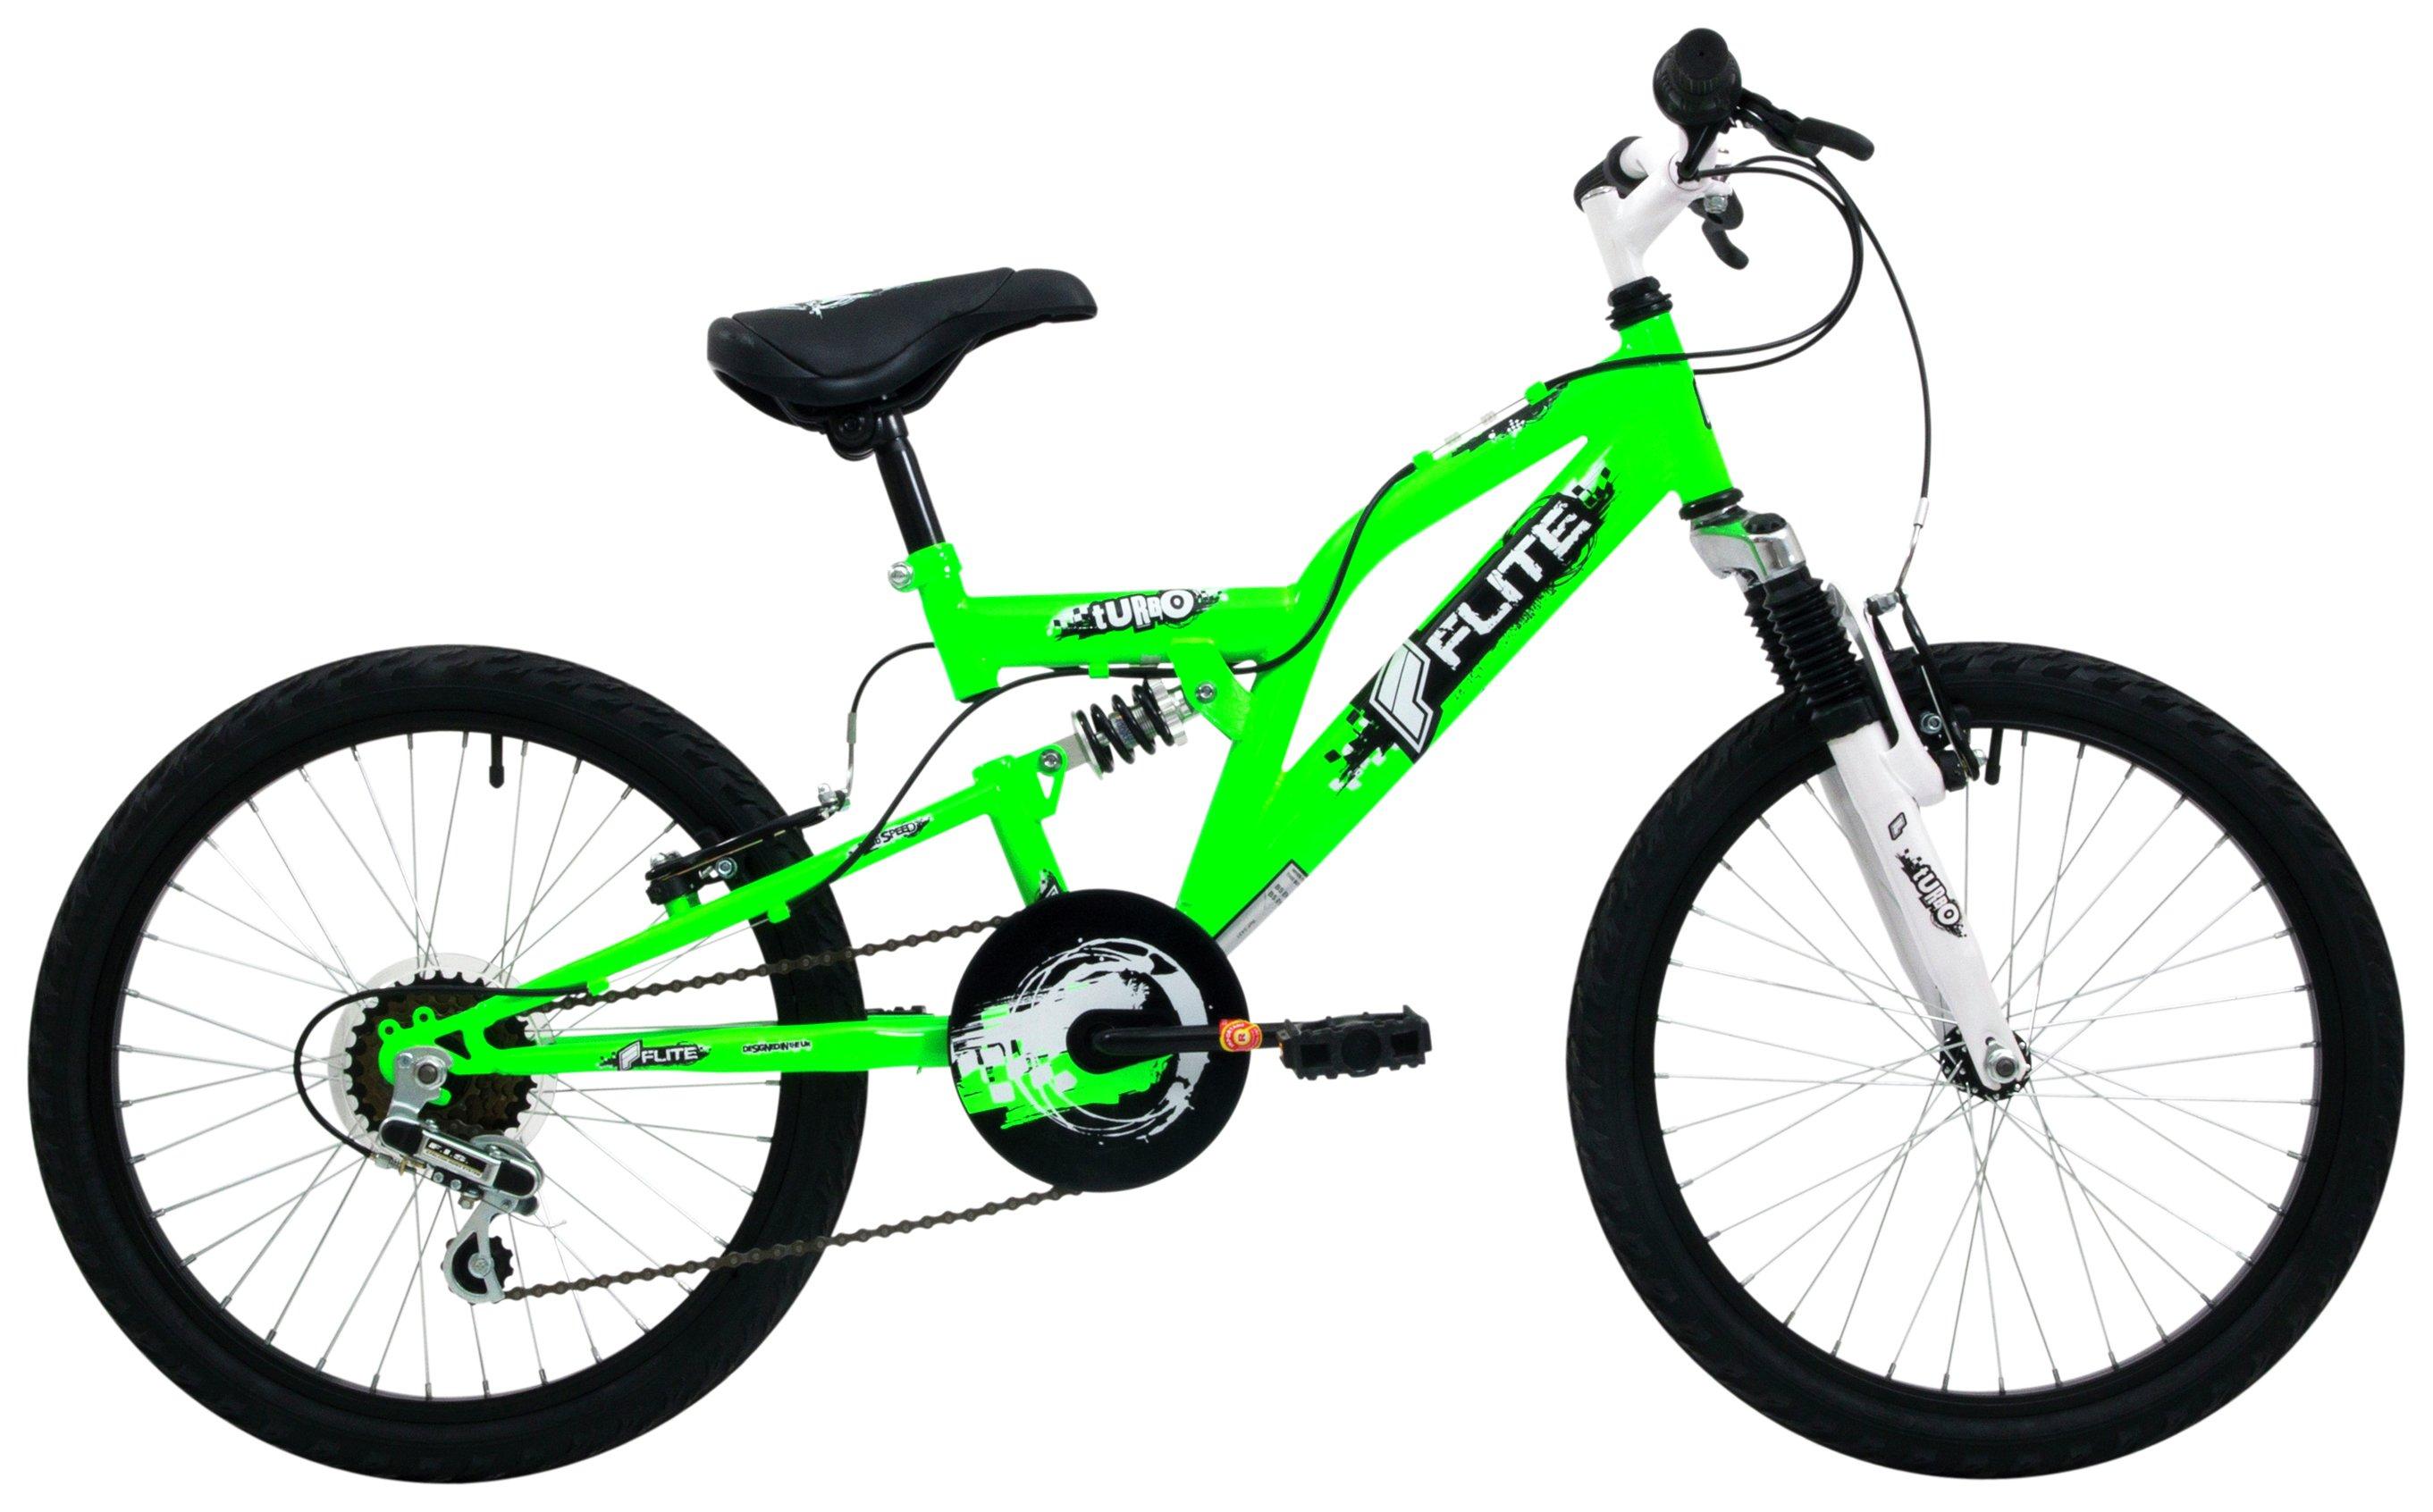 Flite Turbo 20 inch Junior Full Suspension Bike